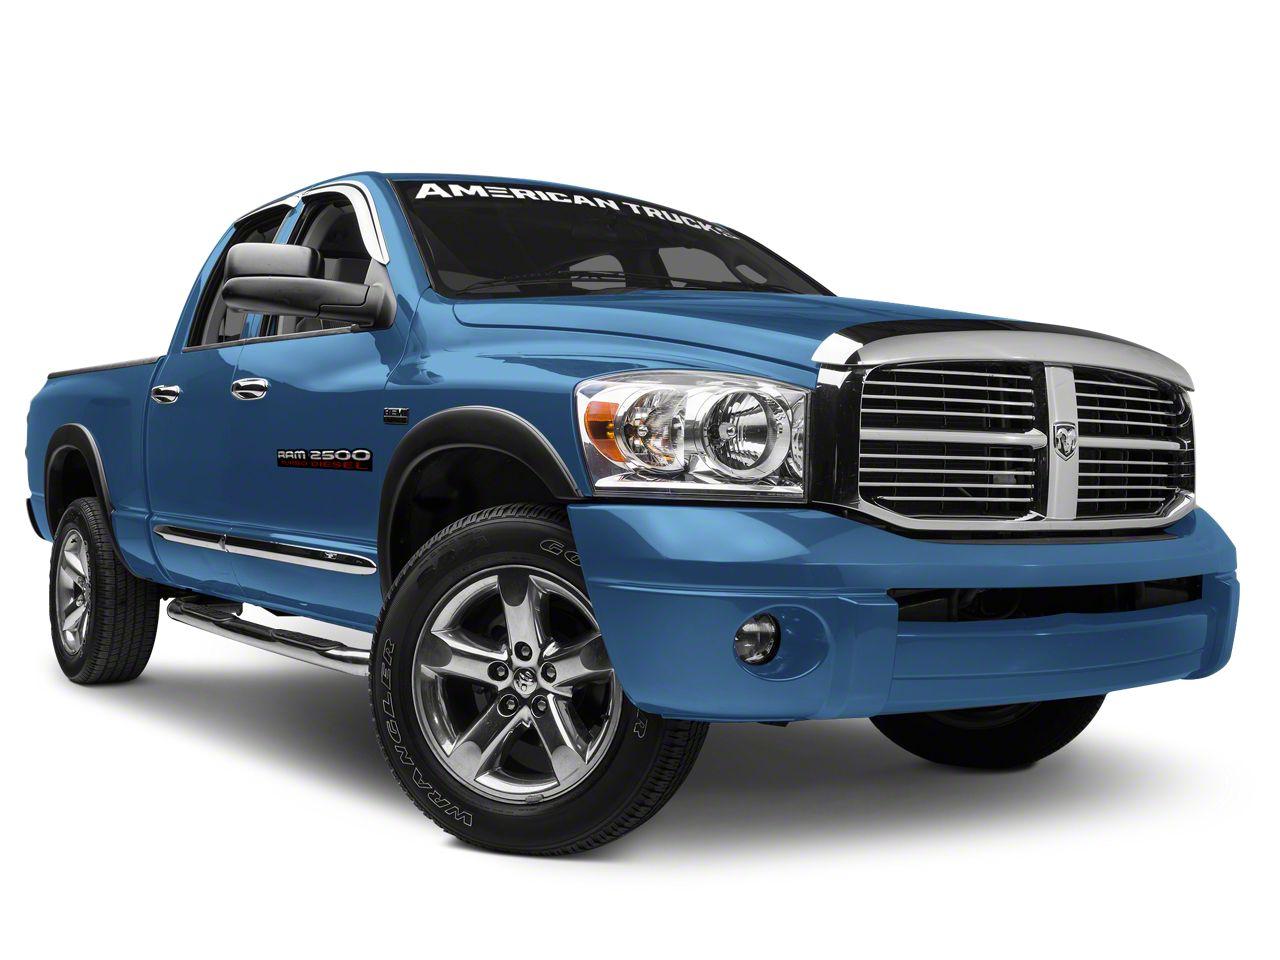 2003-2009 Ram 2500 Parts